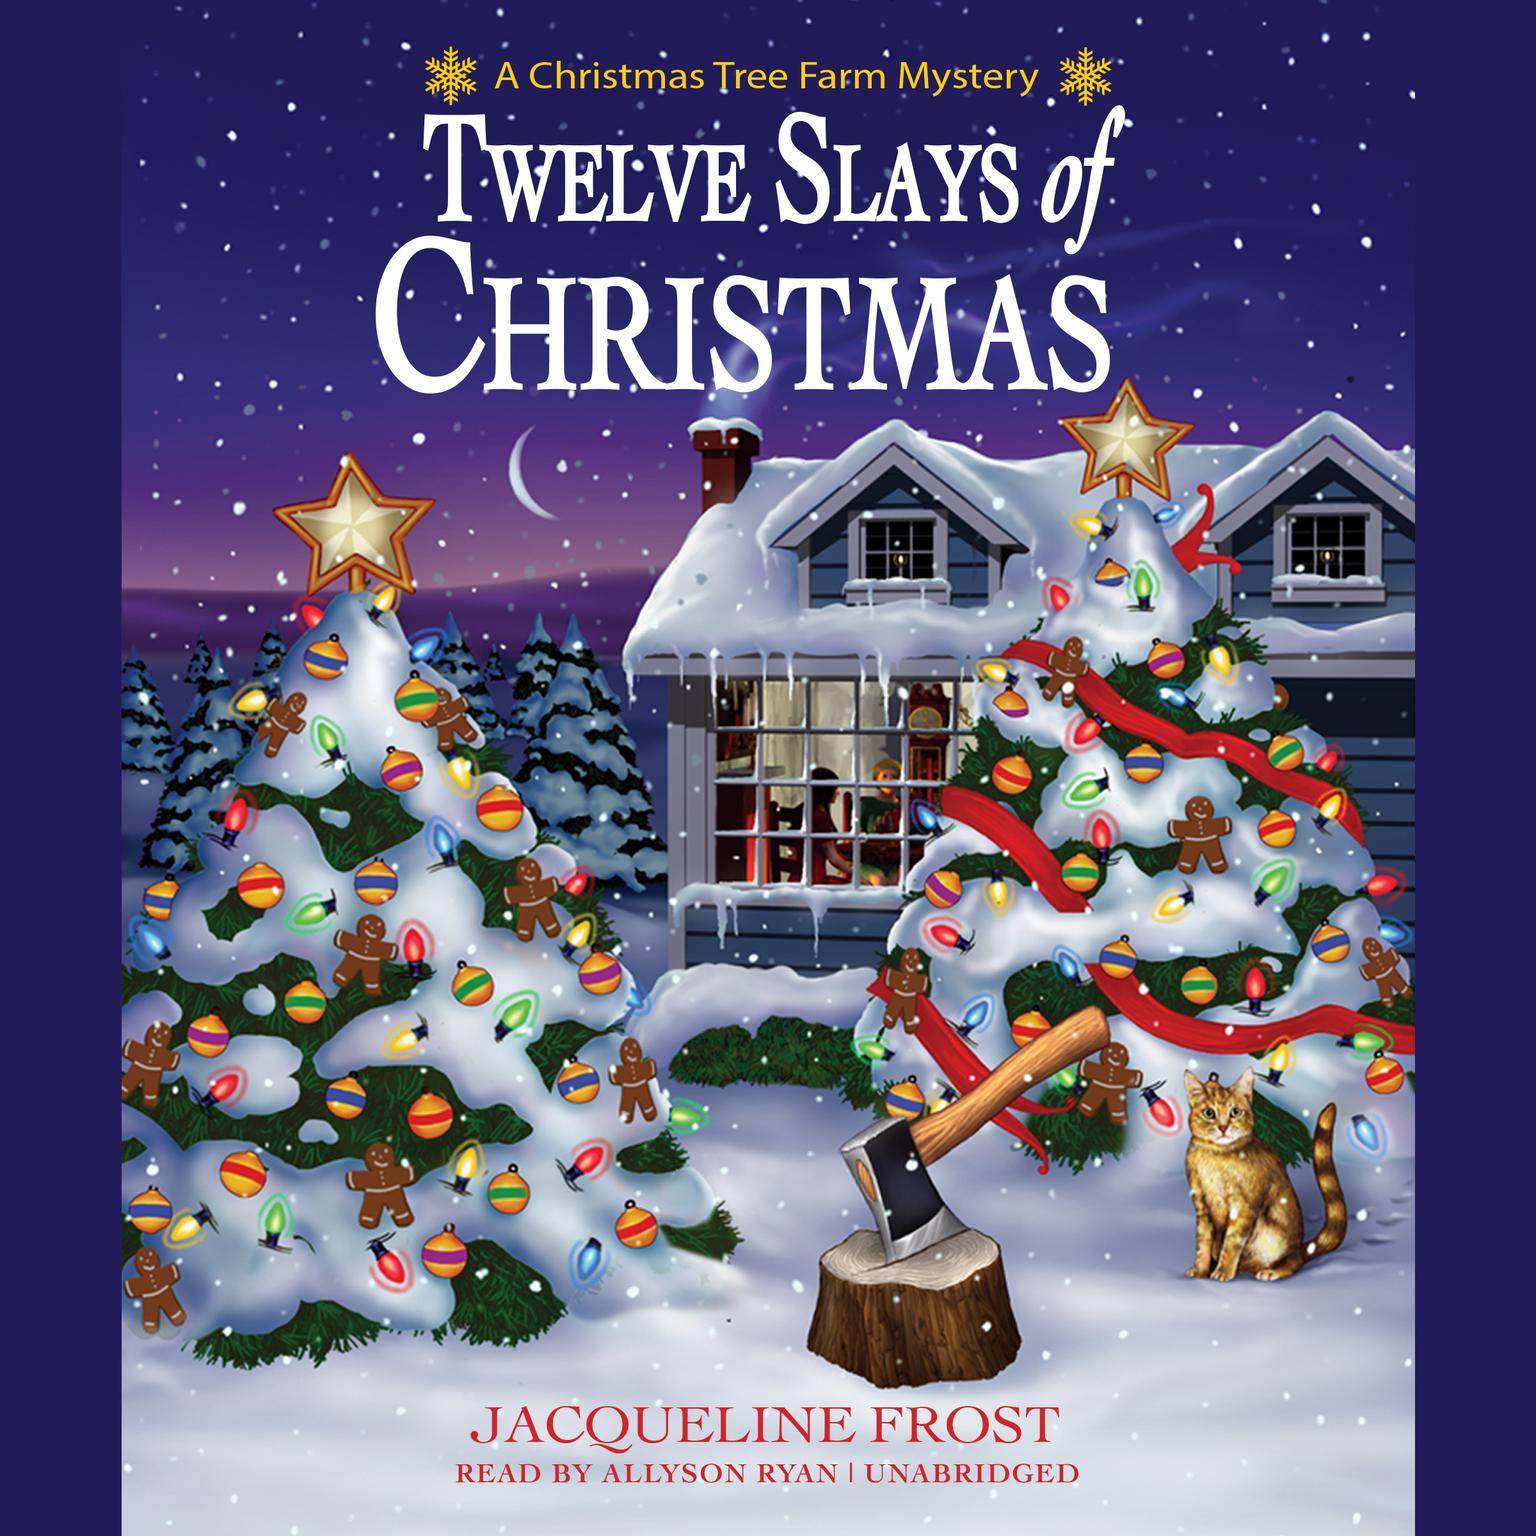 Twelve Slays of Christmas: A Christmas Tree Farm Mystery Audiobook, by Julie Anne Lindsey